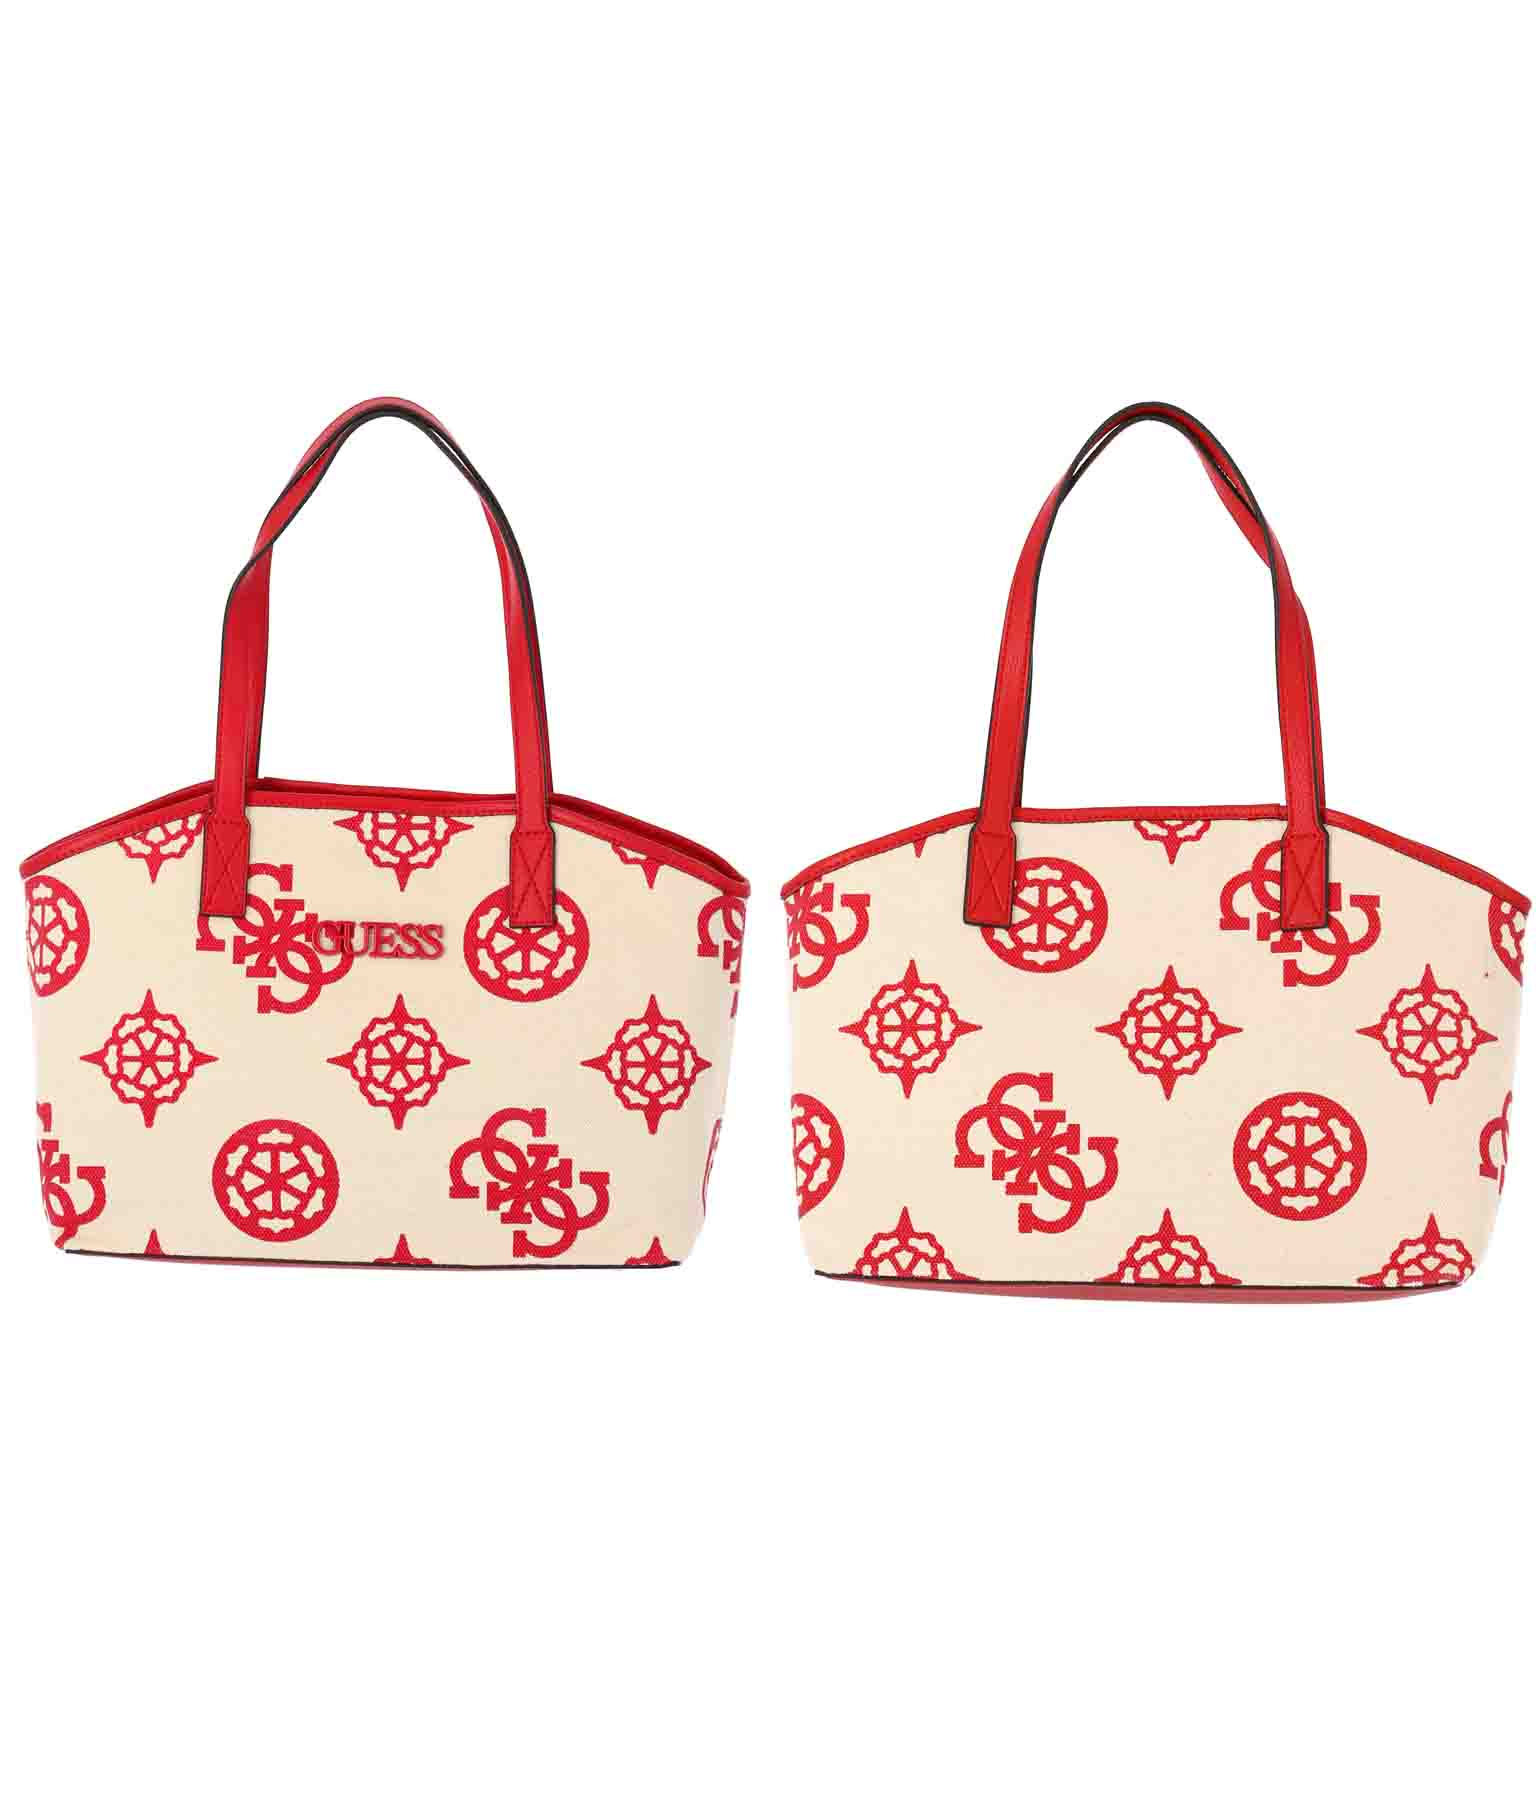 NEW AGE TOTE BAG(バッグ・鞄・小物/トートバッグ) | GUESS